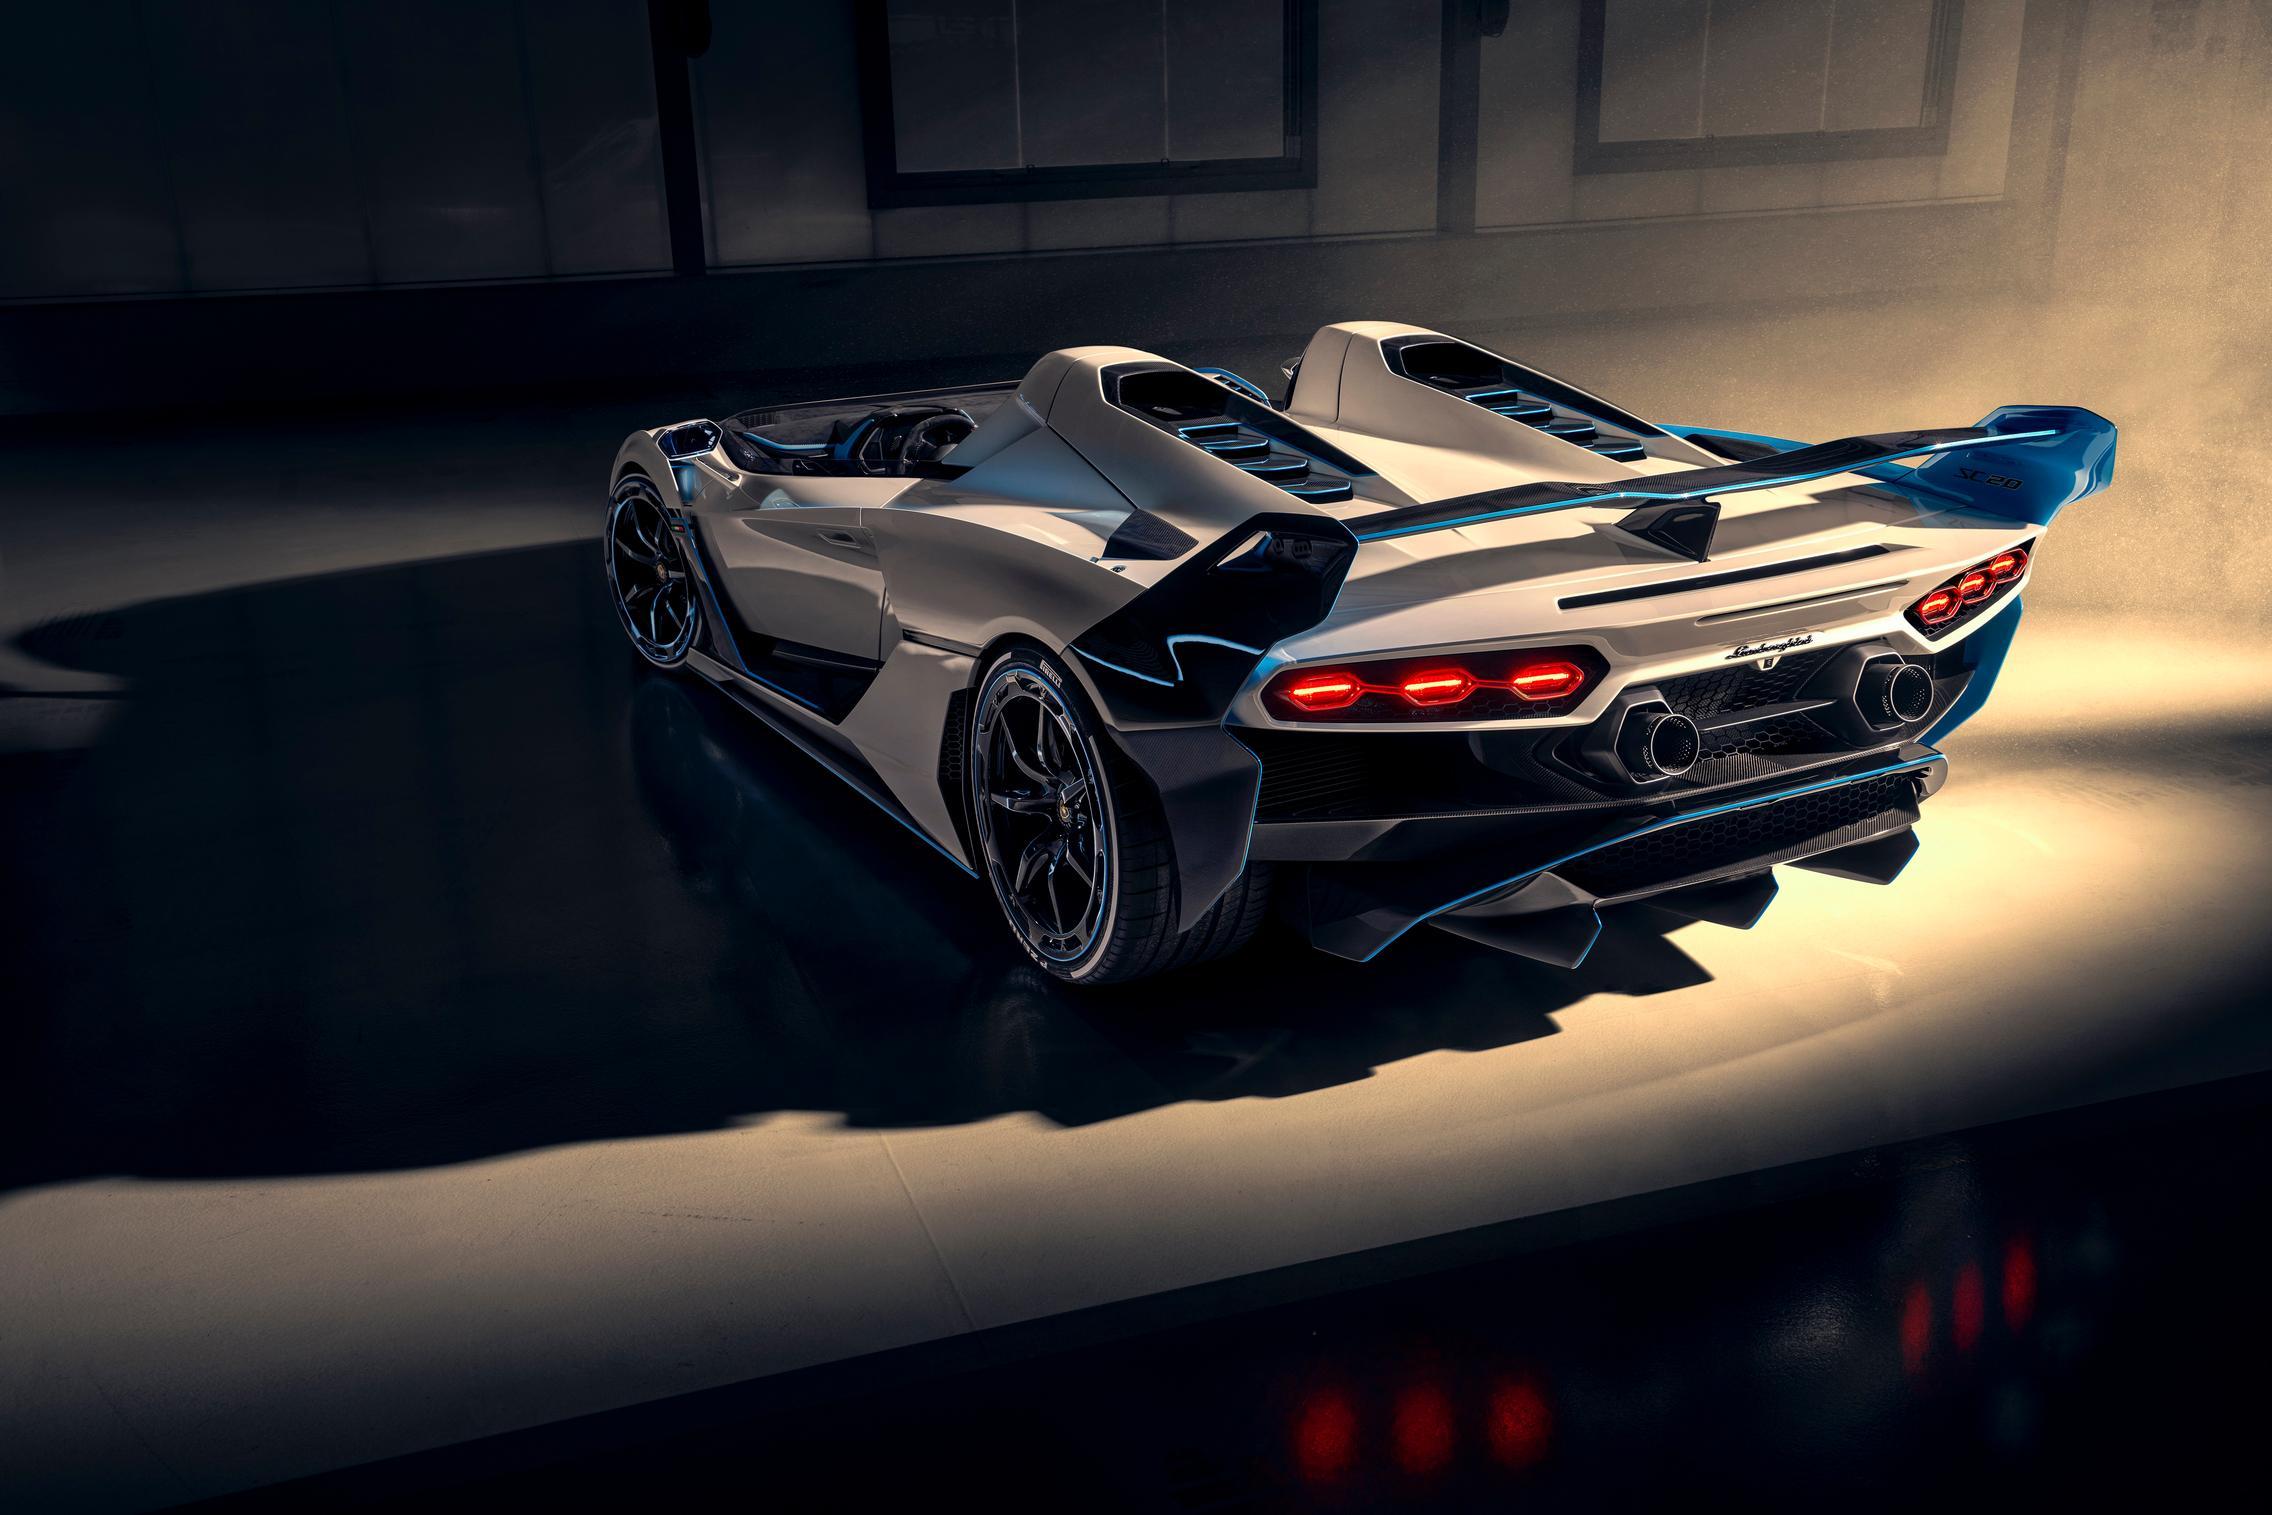 Lamborghini SC20 wallpaper